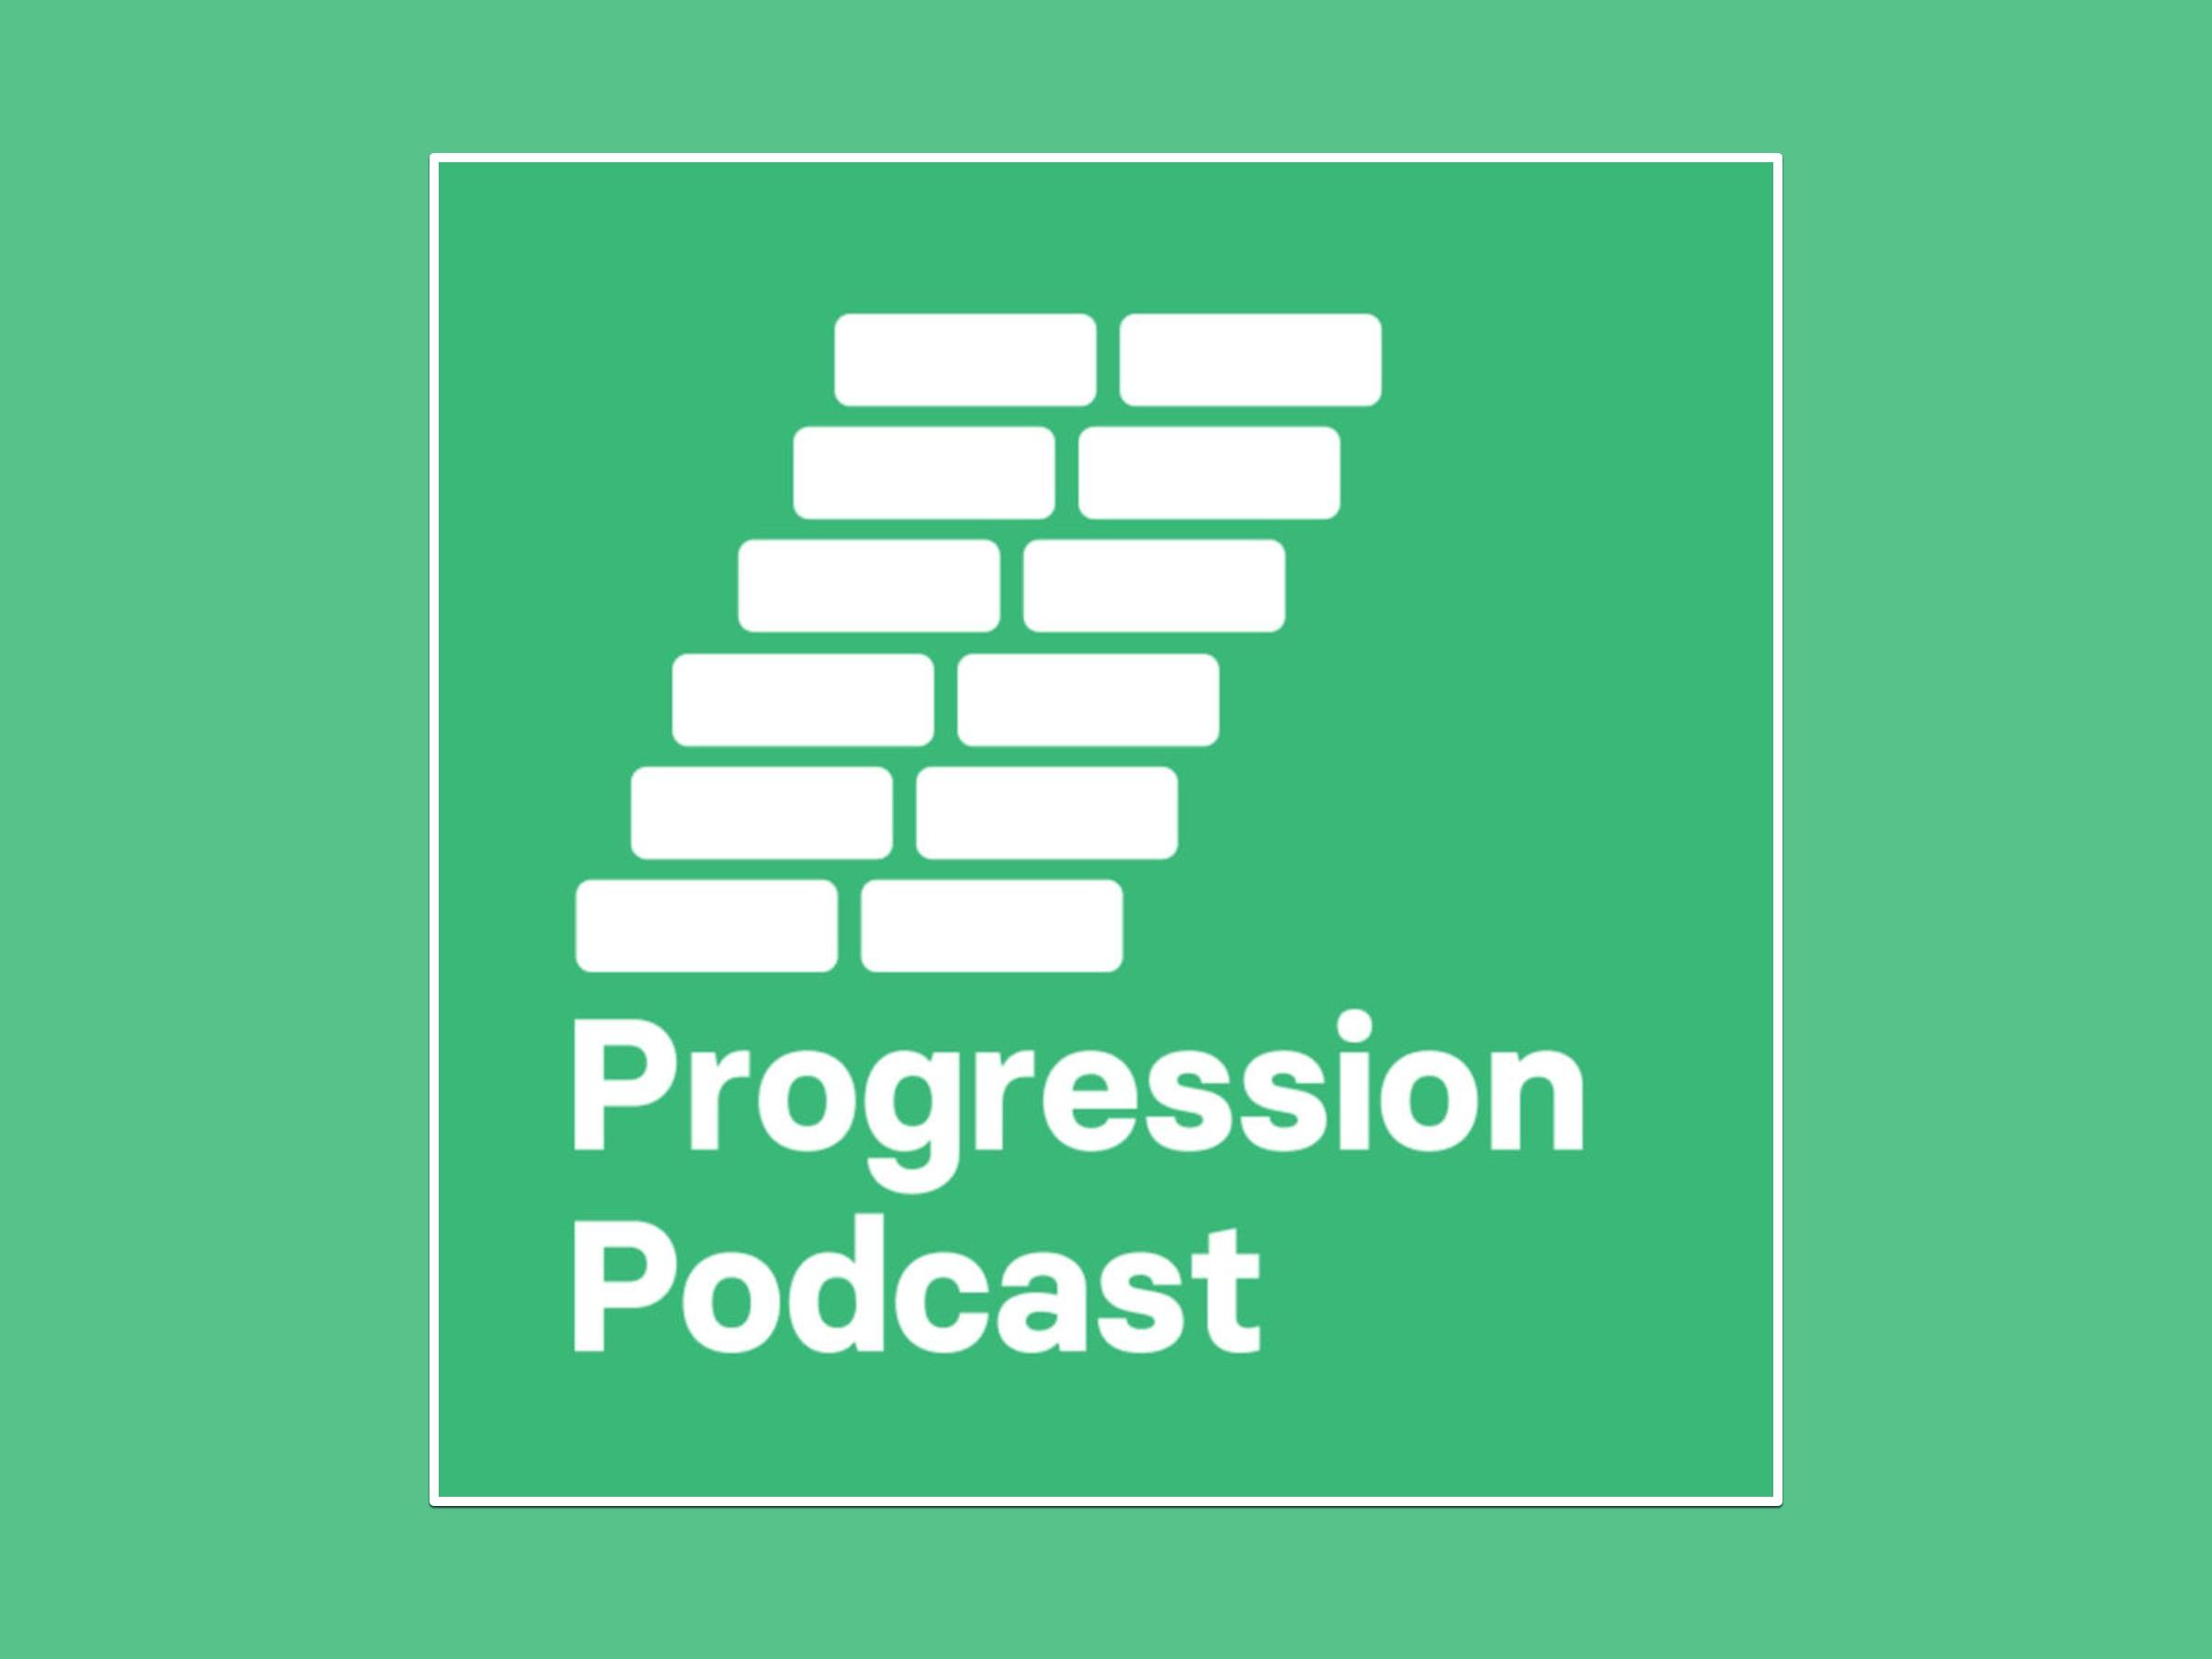 Progression Podcast artwork